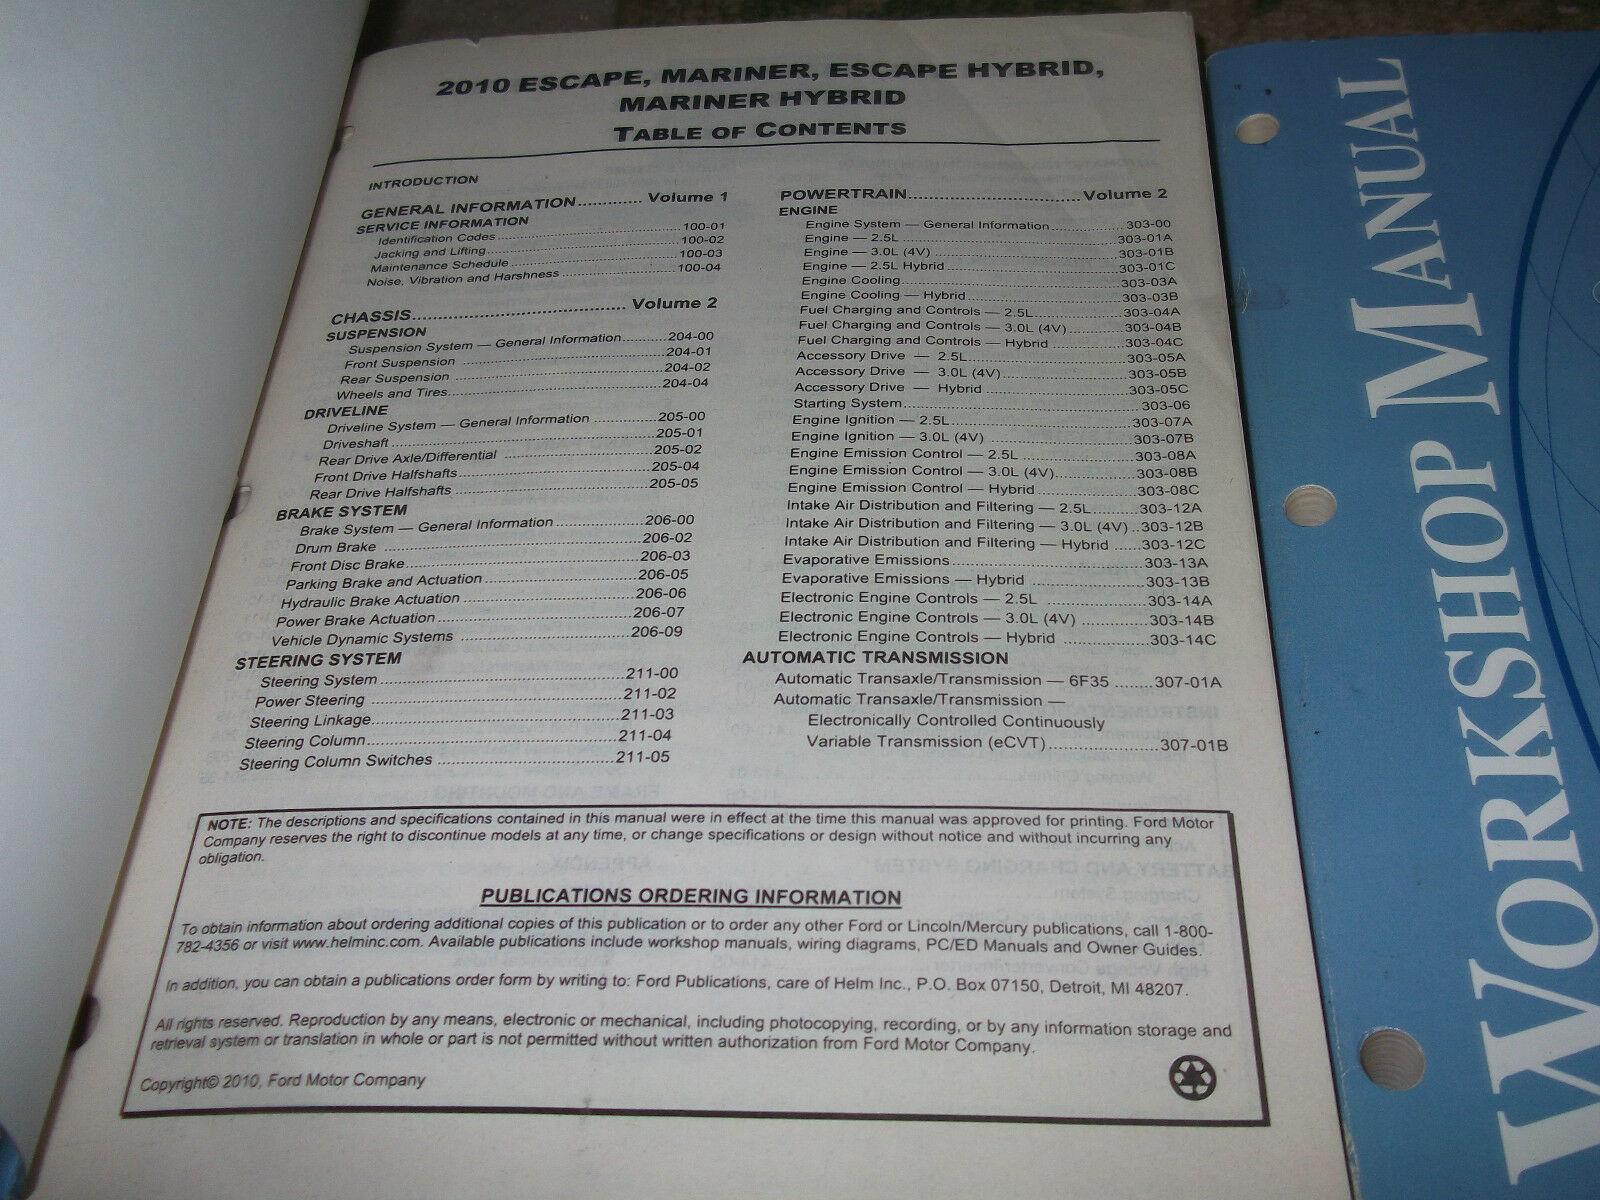 2010 Ford Escape Mercury Mariner & Hybrid Service Shop Repair Manual SET OEM image 2